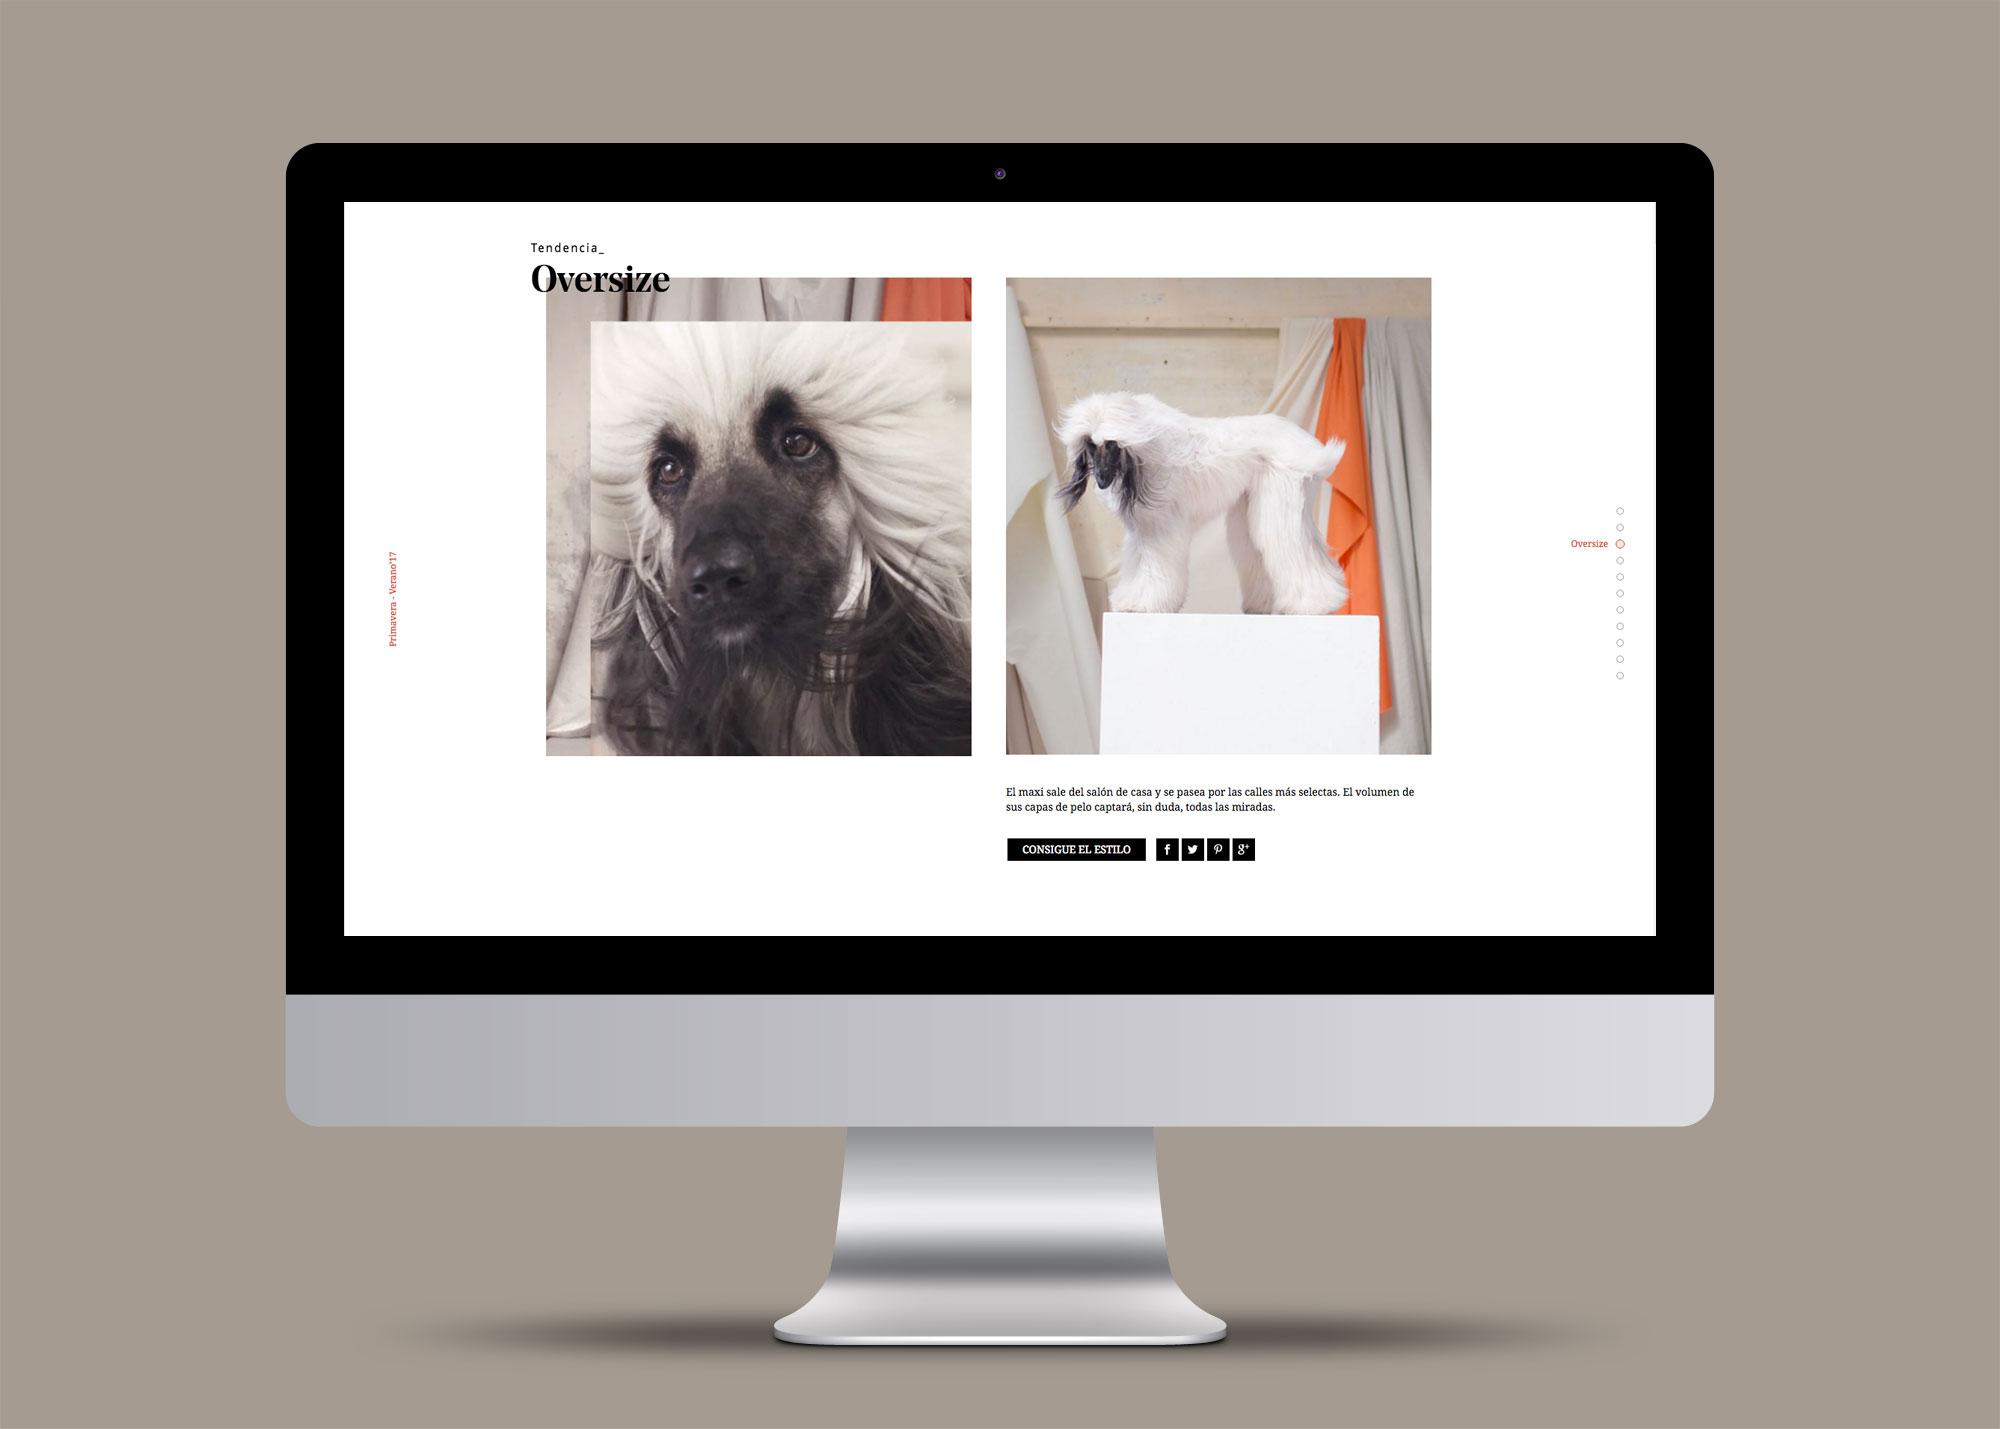 metode-design-nosonunamoda-02